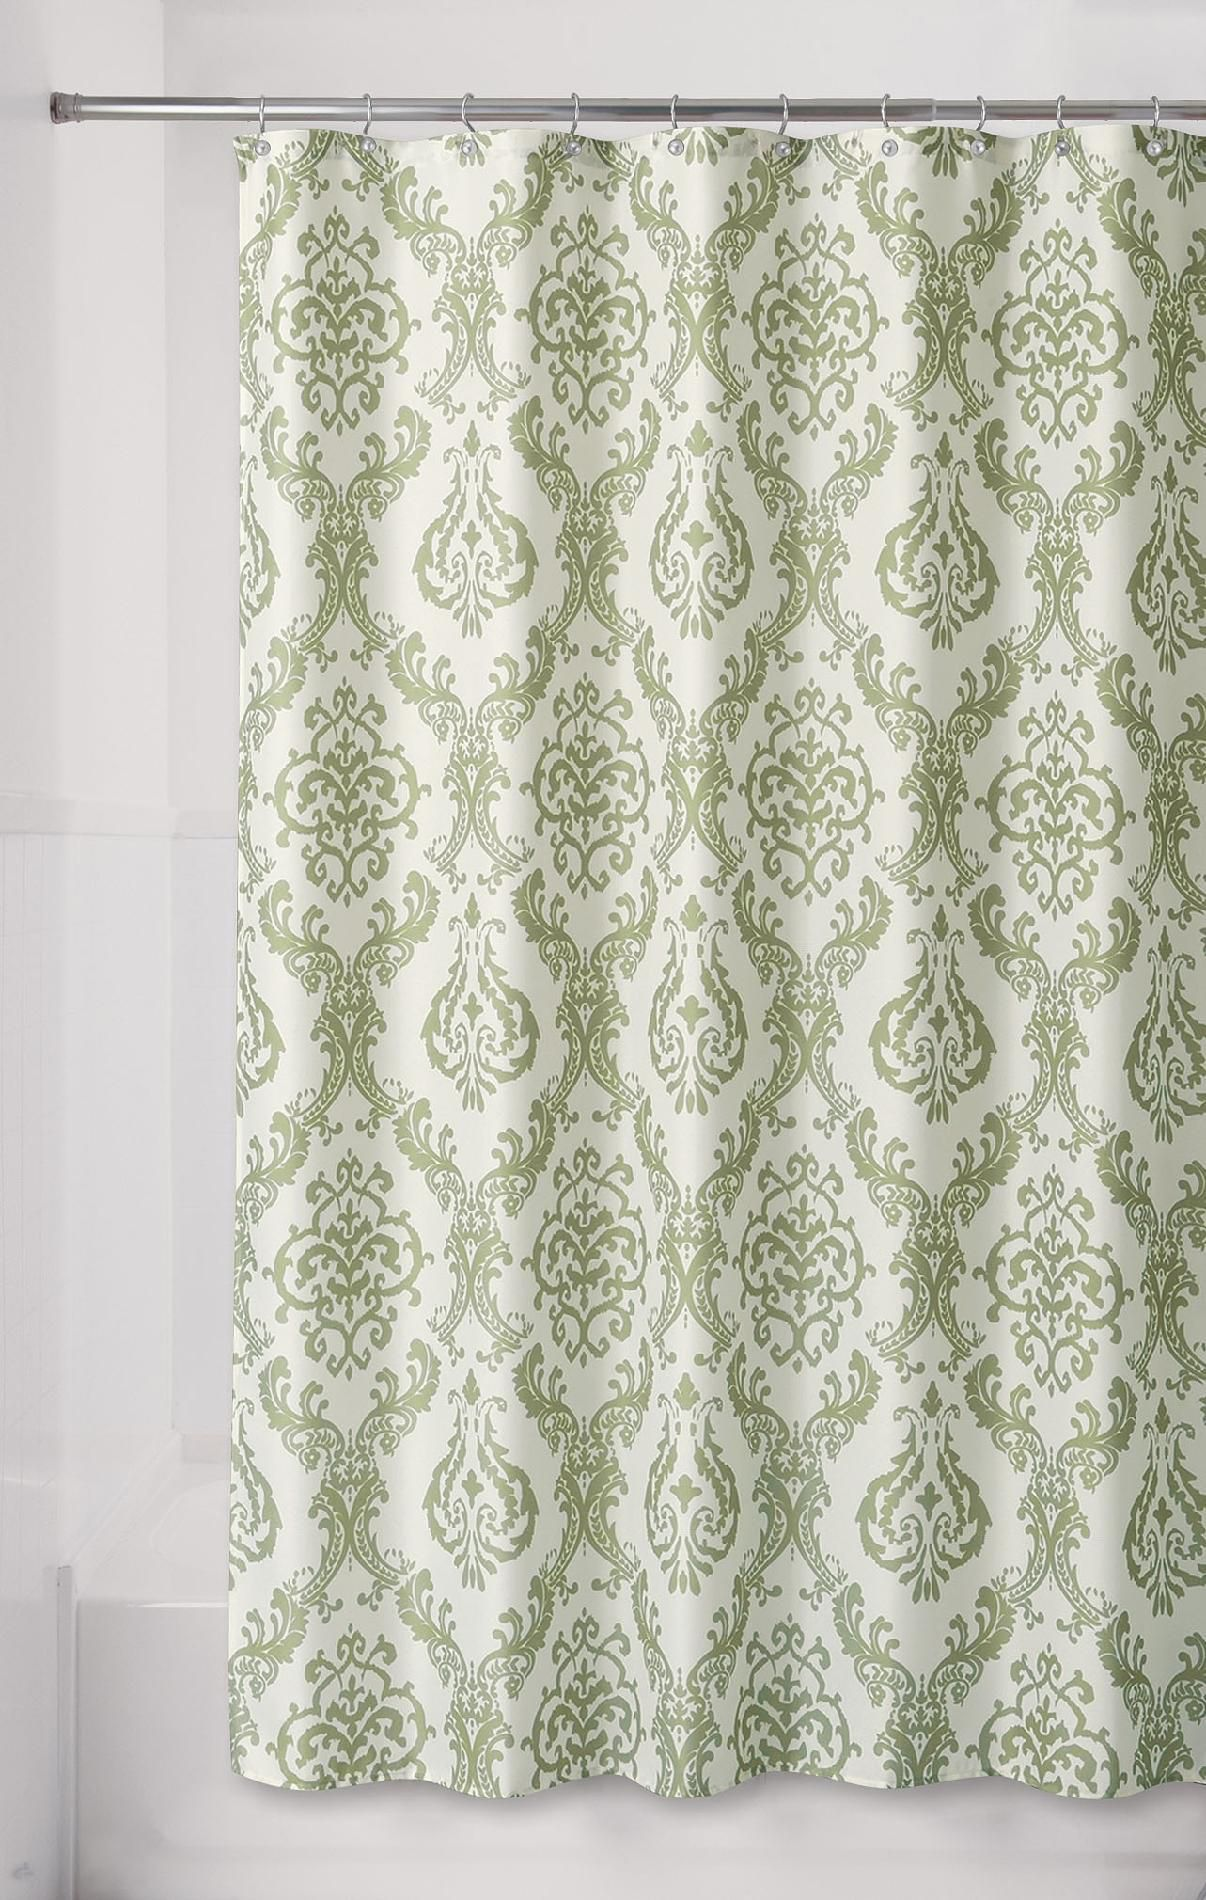 Sears Green Damask Shower Curtain Pretty Shower Curtains Fabric